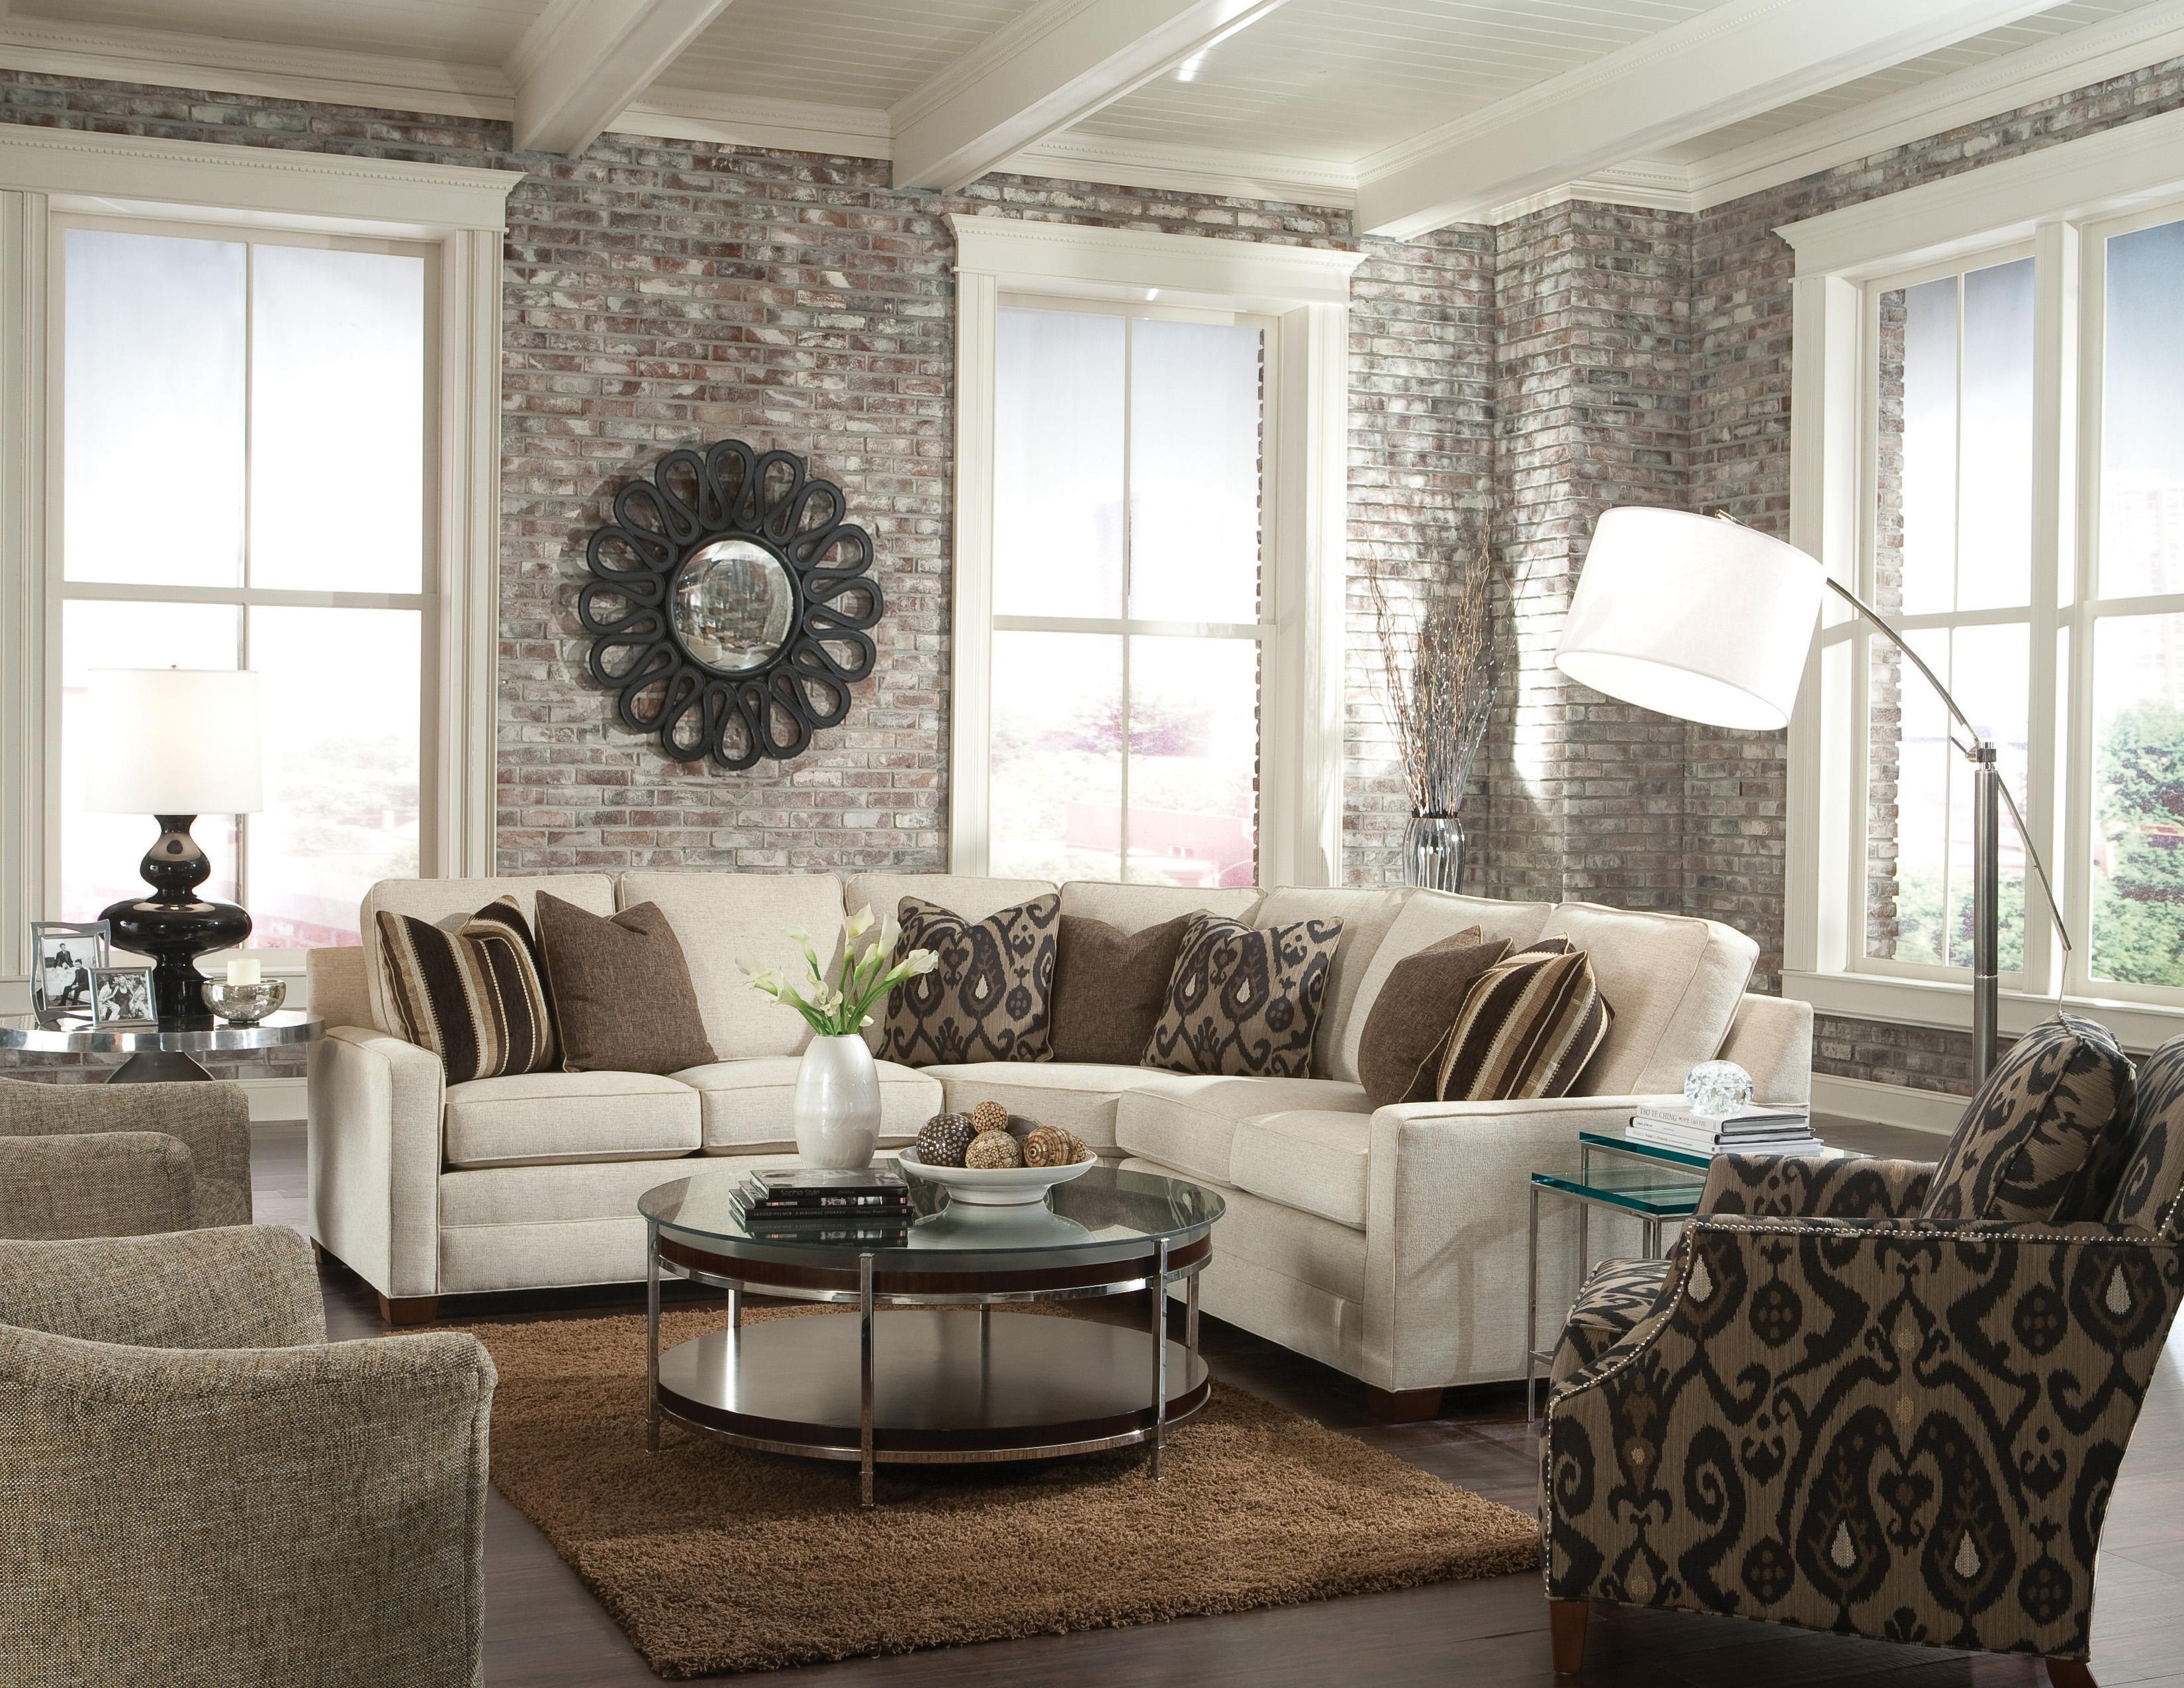 Sectional Sofa With Corner Table Wedge Refil Sofa